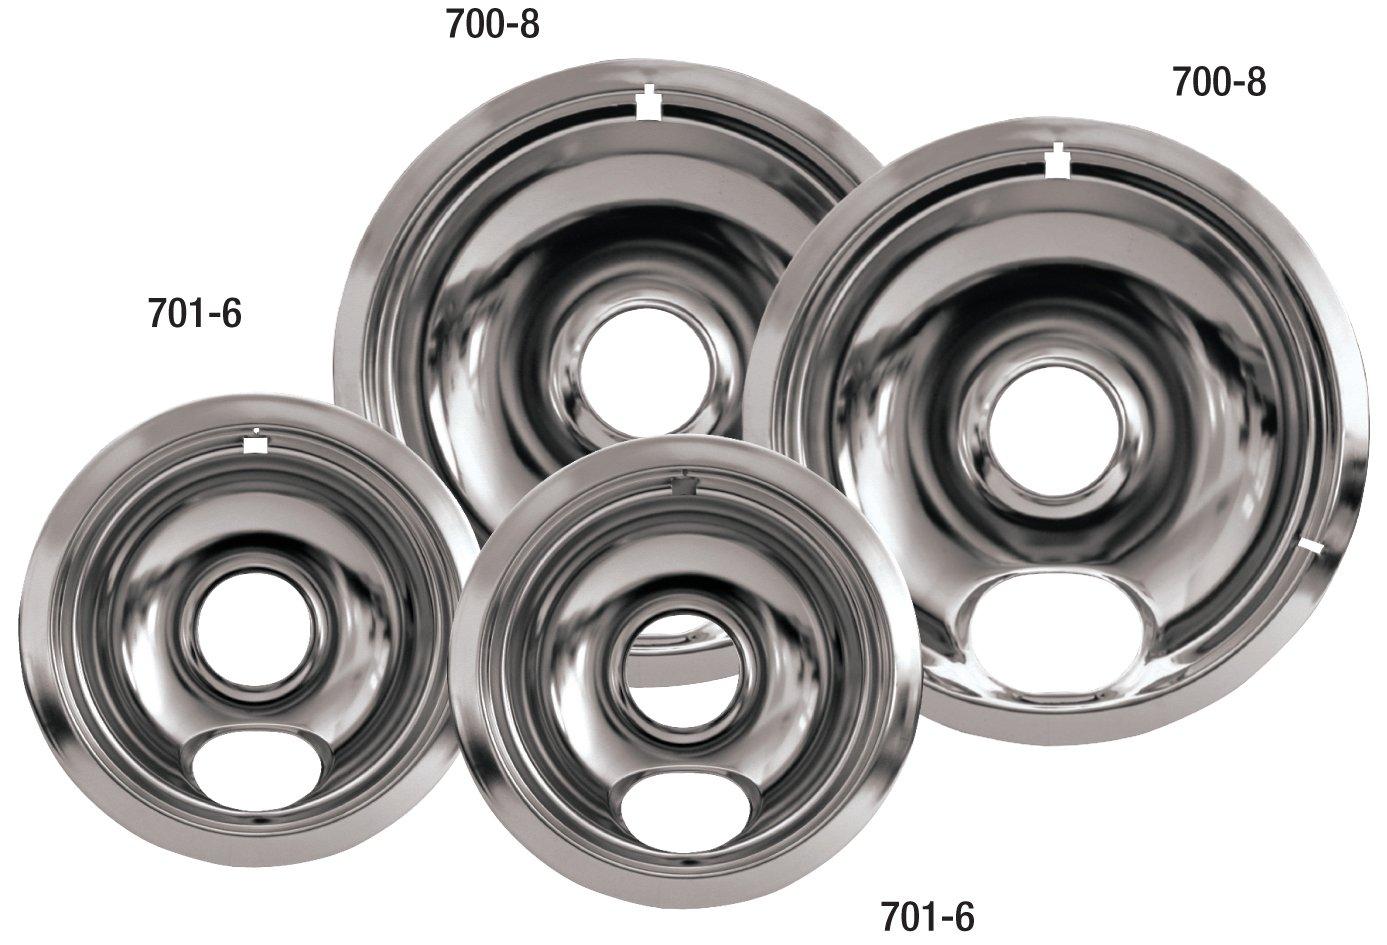 Amazon.com: Whirlpool W10278125 Drip Pan Kit, Chrome: Home Improvement